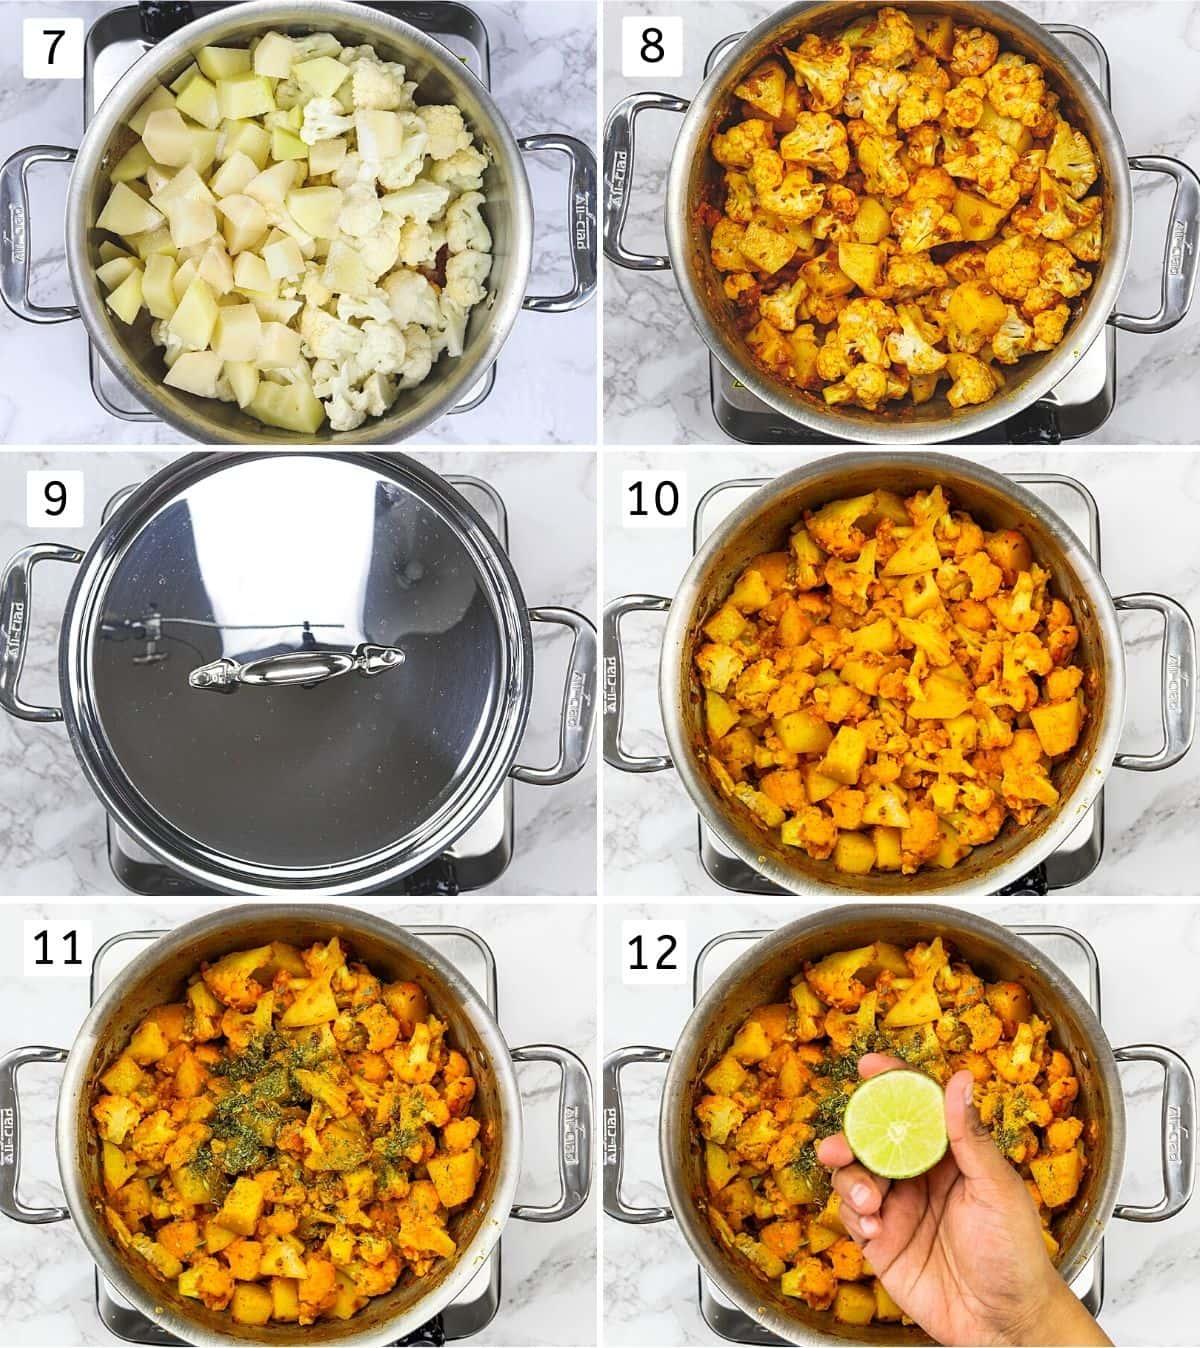 Collage of 6 steps showing adding, mixing potatoes, cauliflower, cook covered, adding kasoori methi, lime juice.